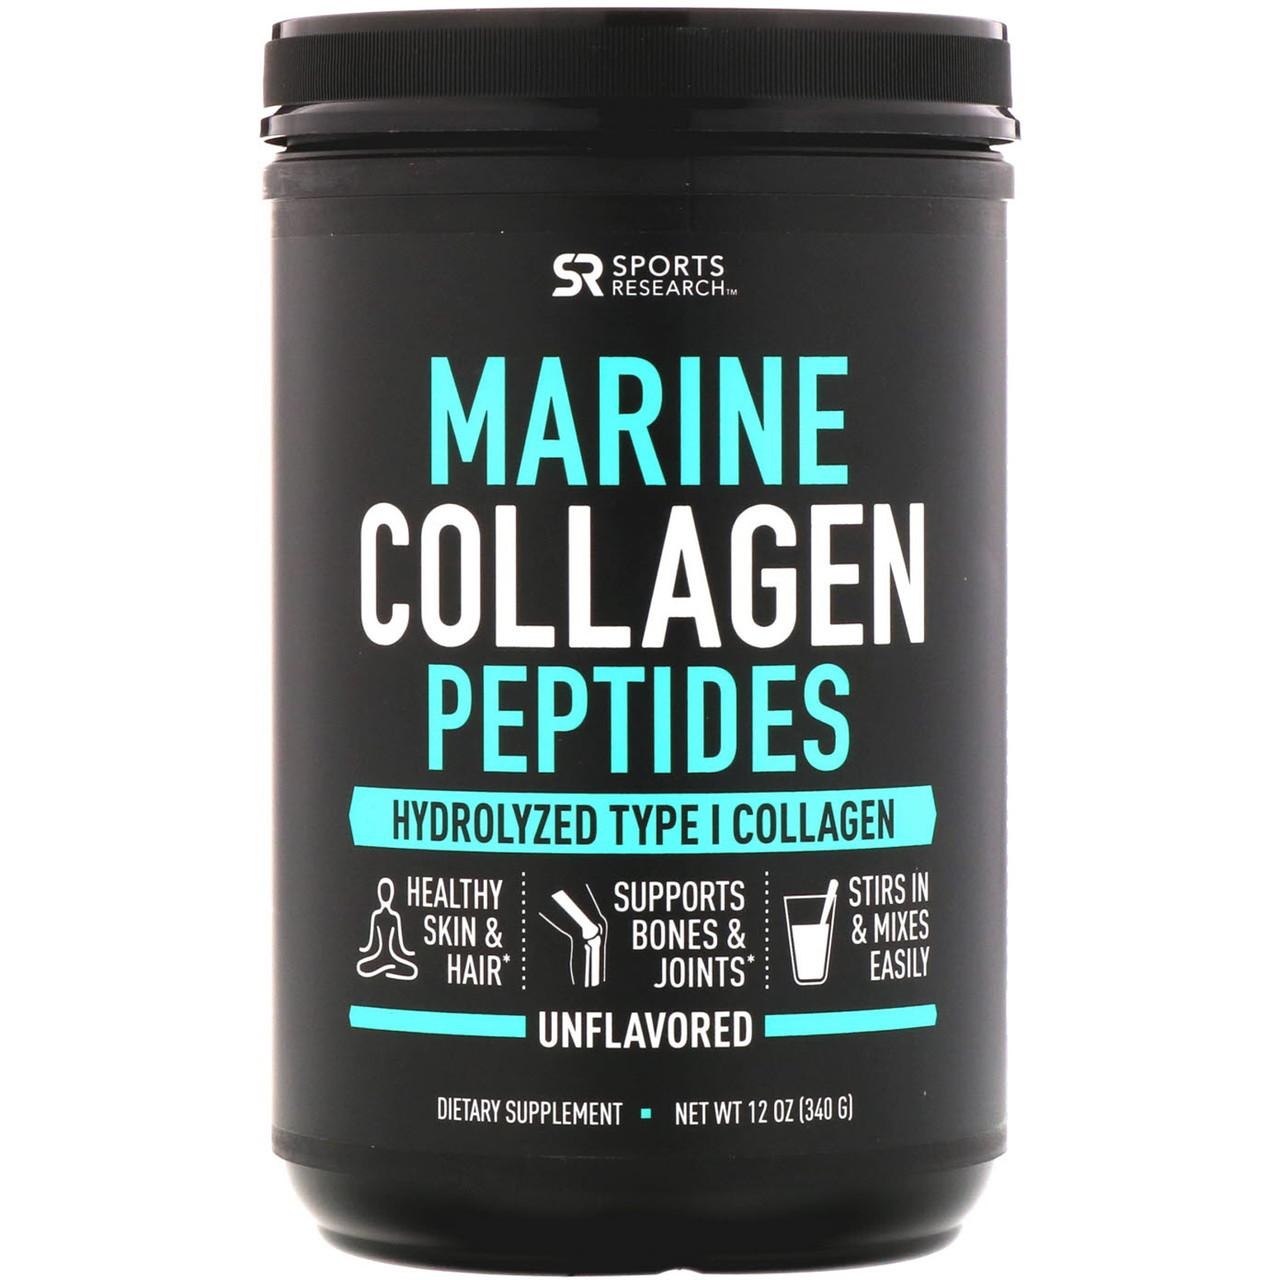 Sports Research, Морские пептиды коллагена, без ароматизаторов, 12 унц. (340 г)